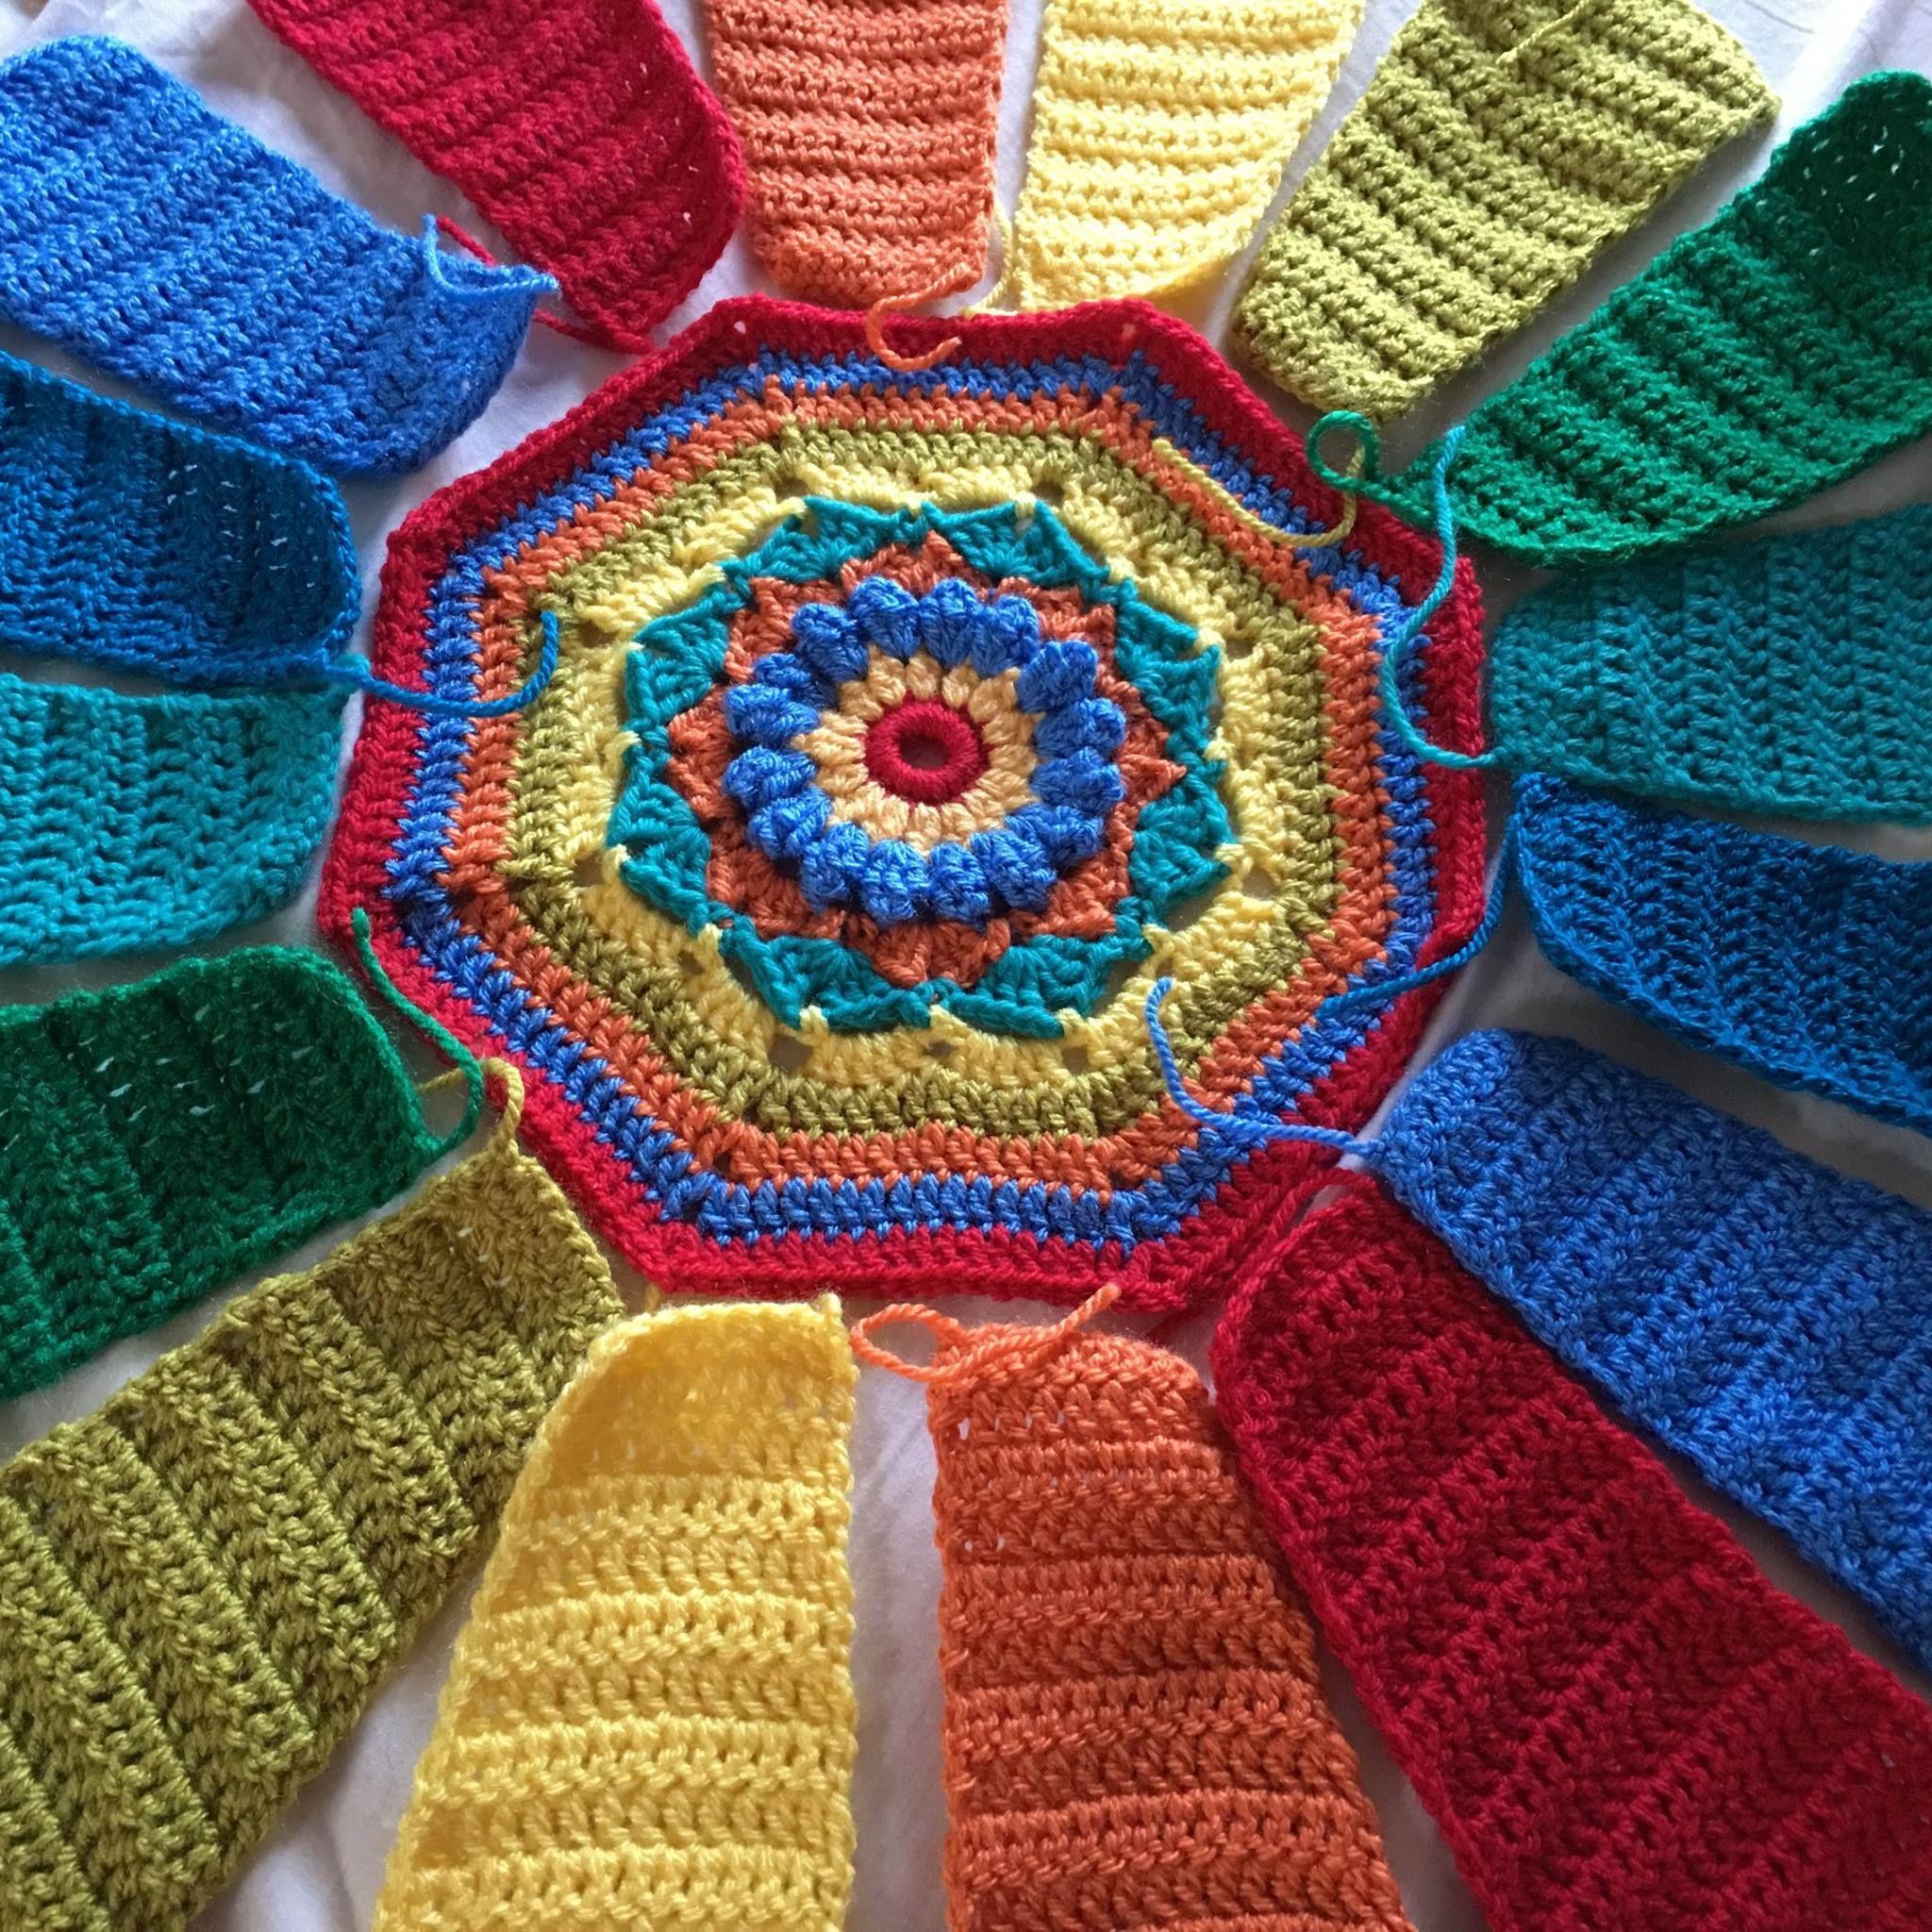 Pin de gloria elena en muestras crochet   Pinterest   Mandalas ...